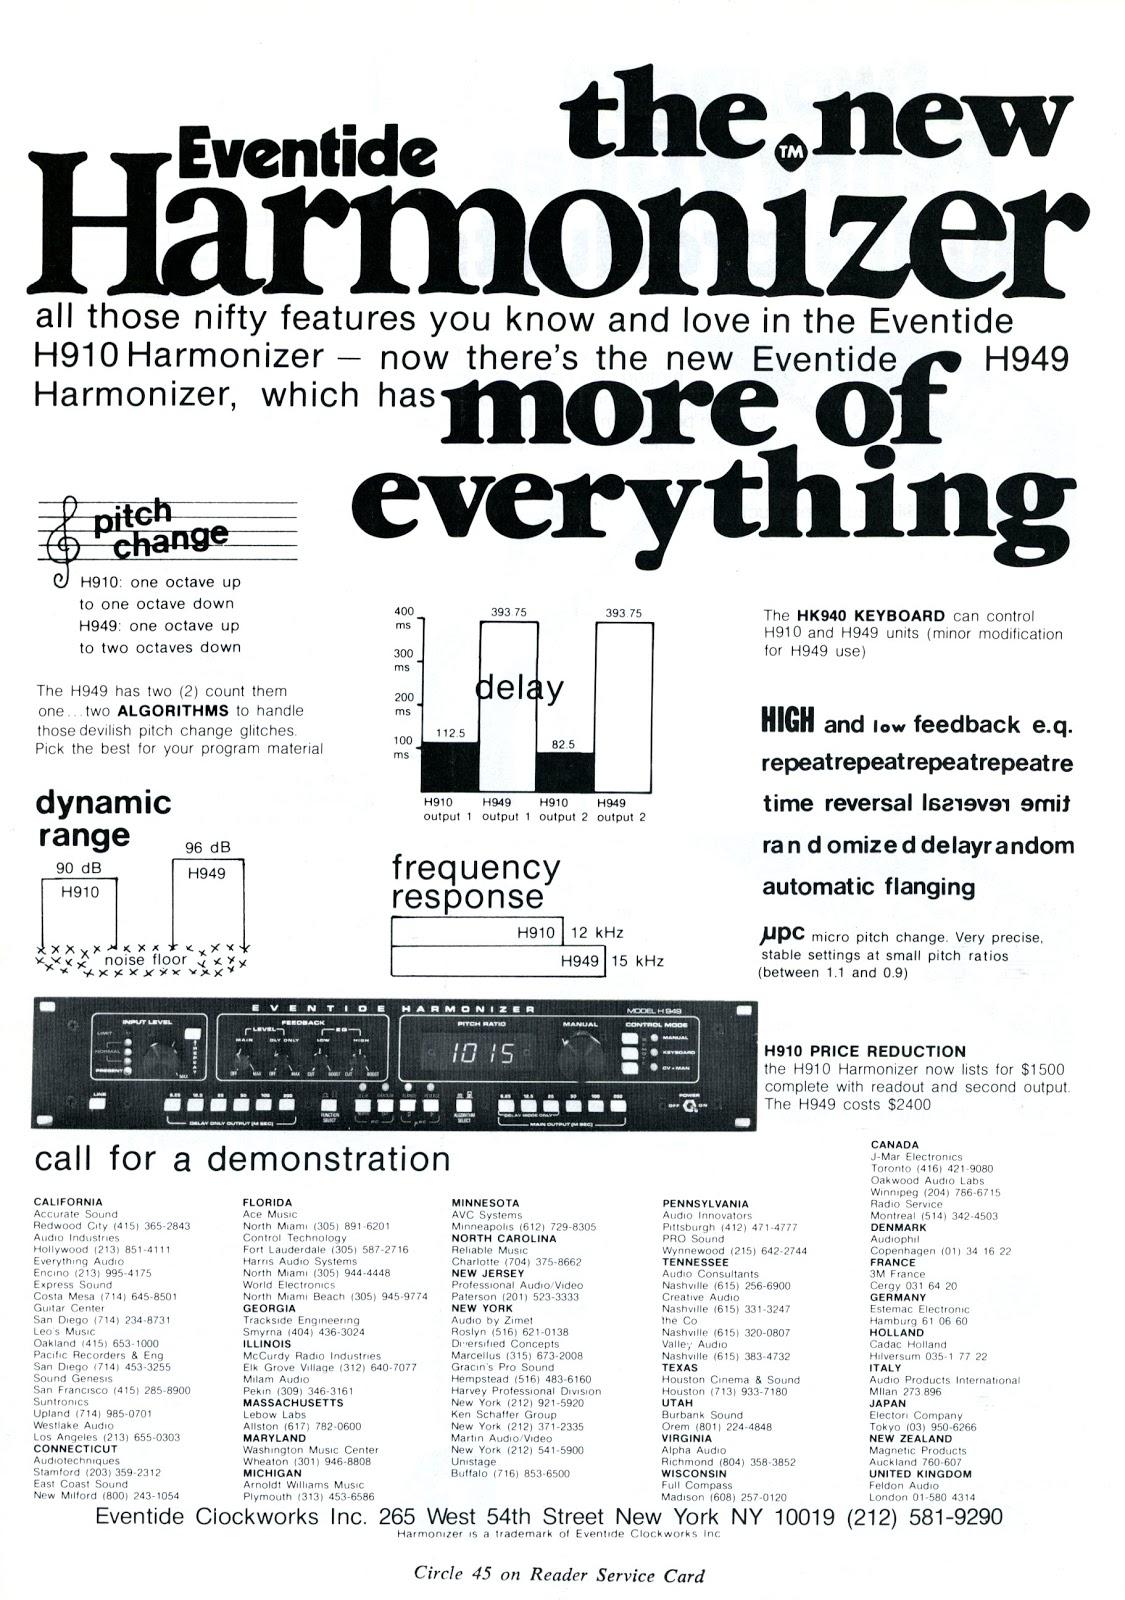 1979 Ad